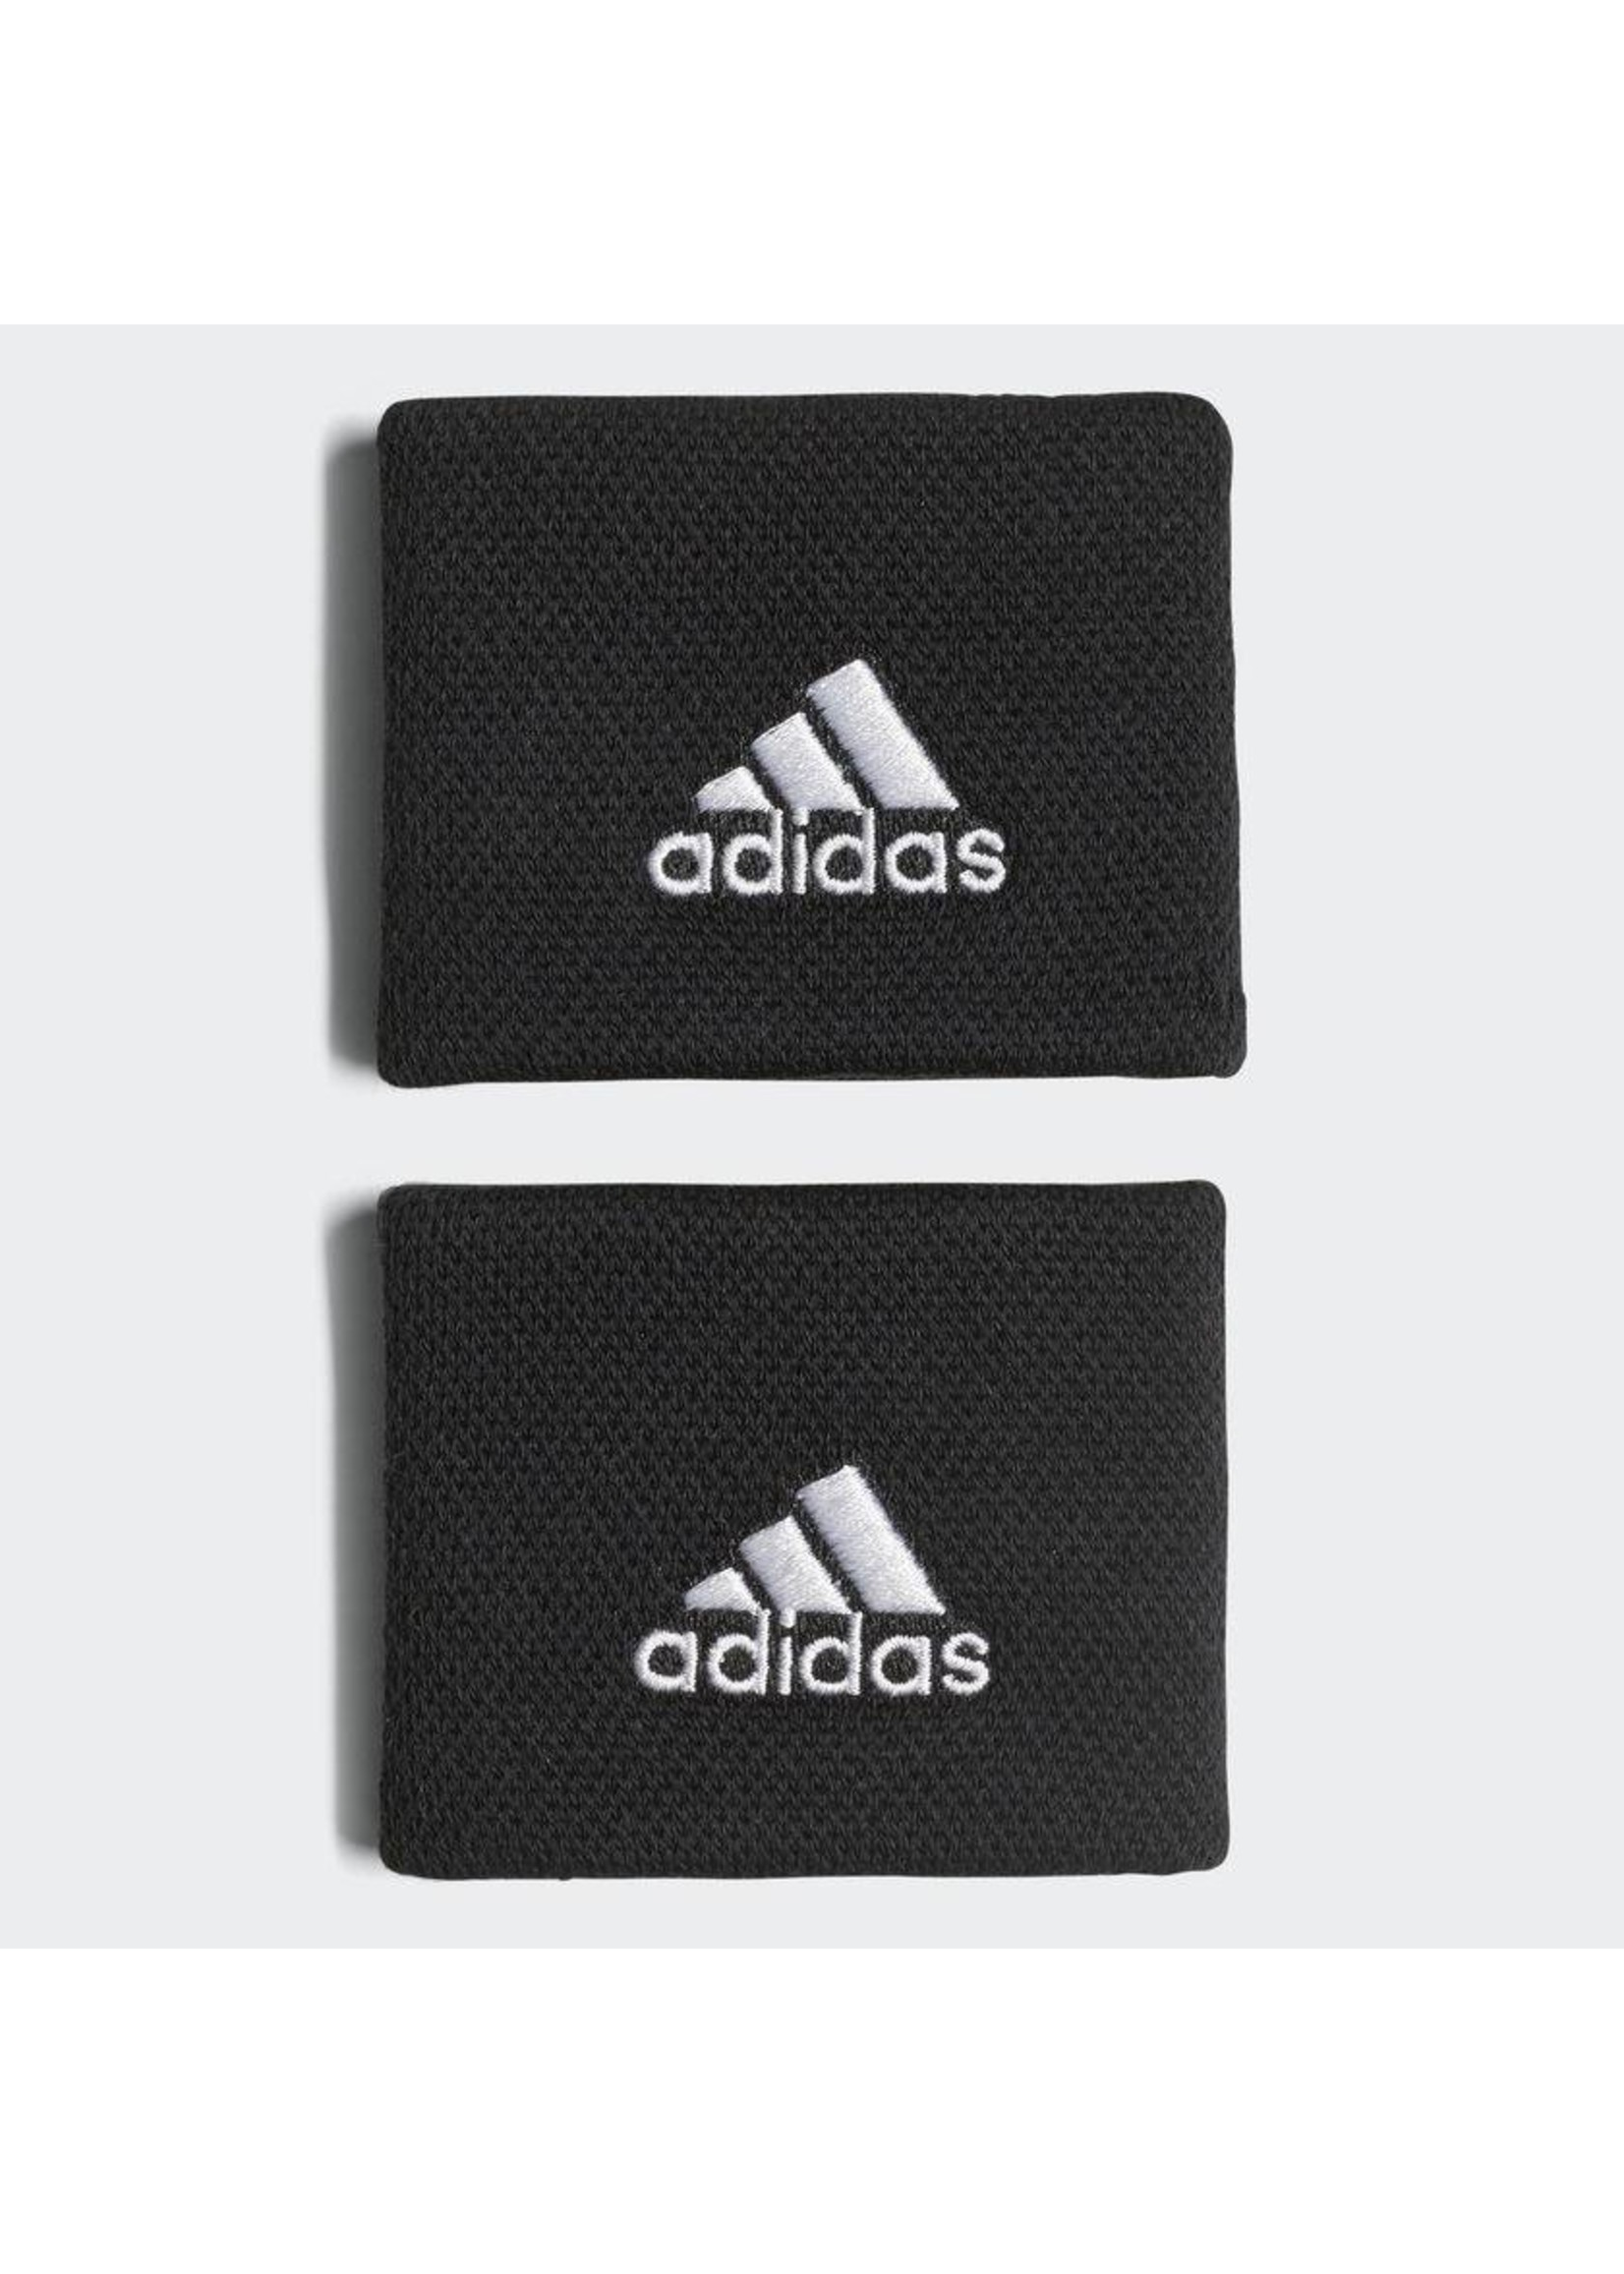 Adidas Wristbands - Various Colours (2018)